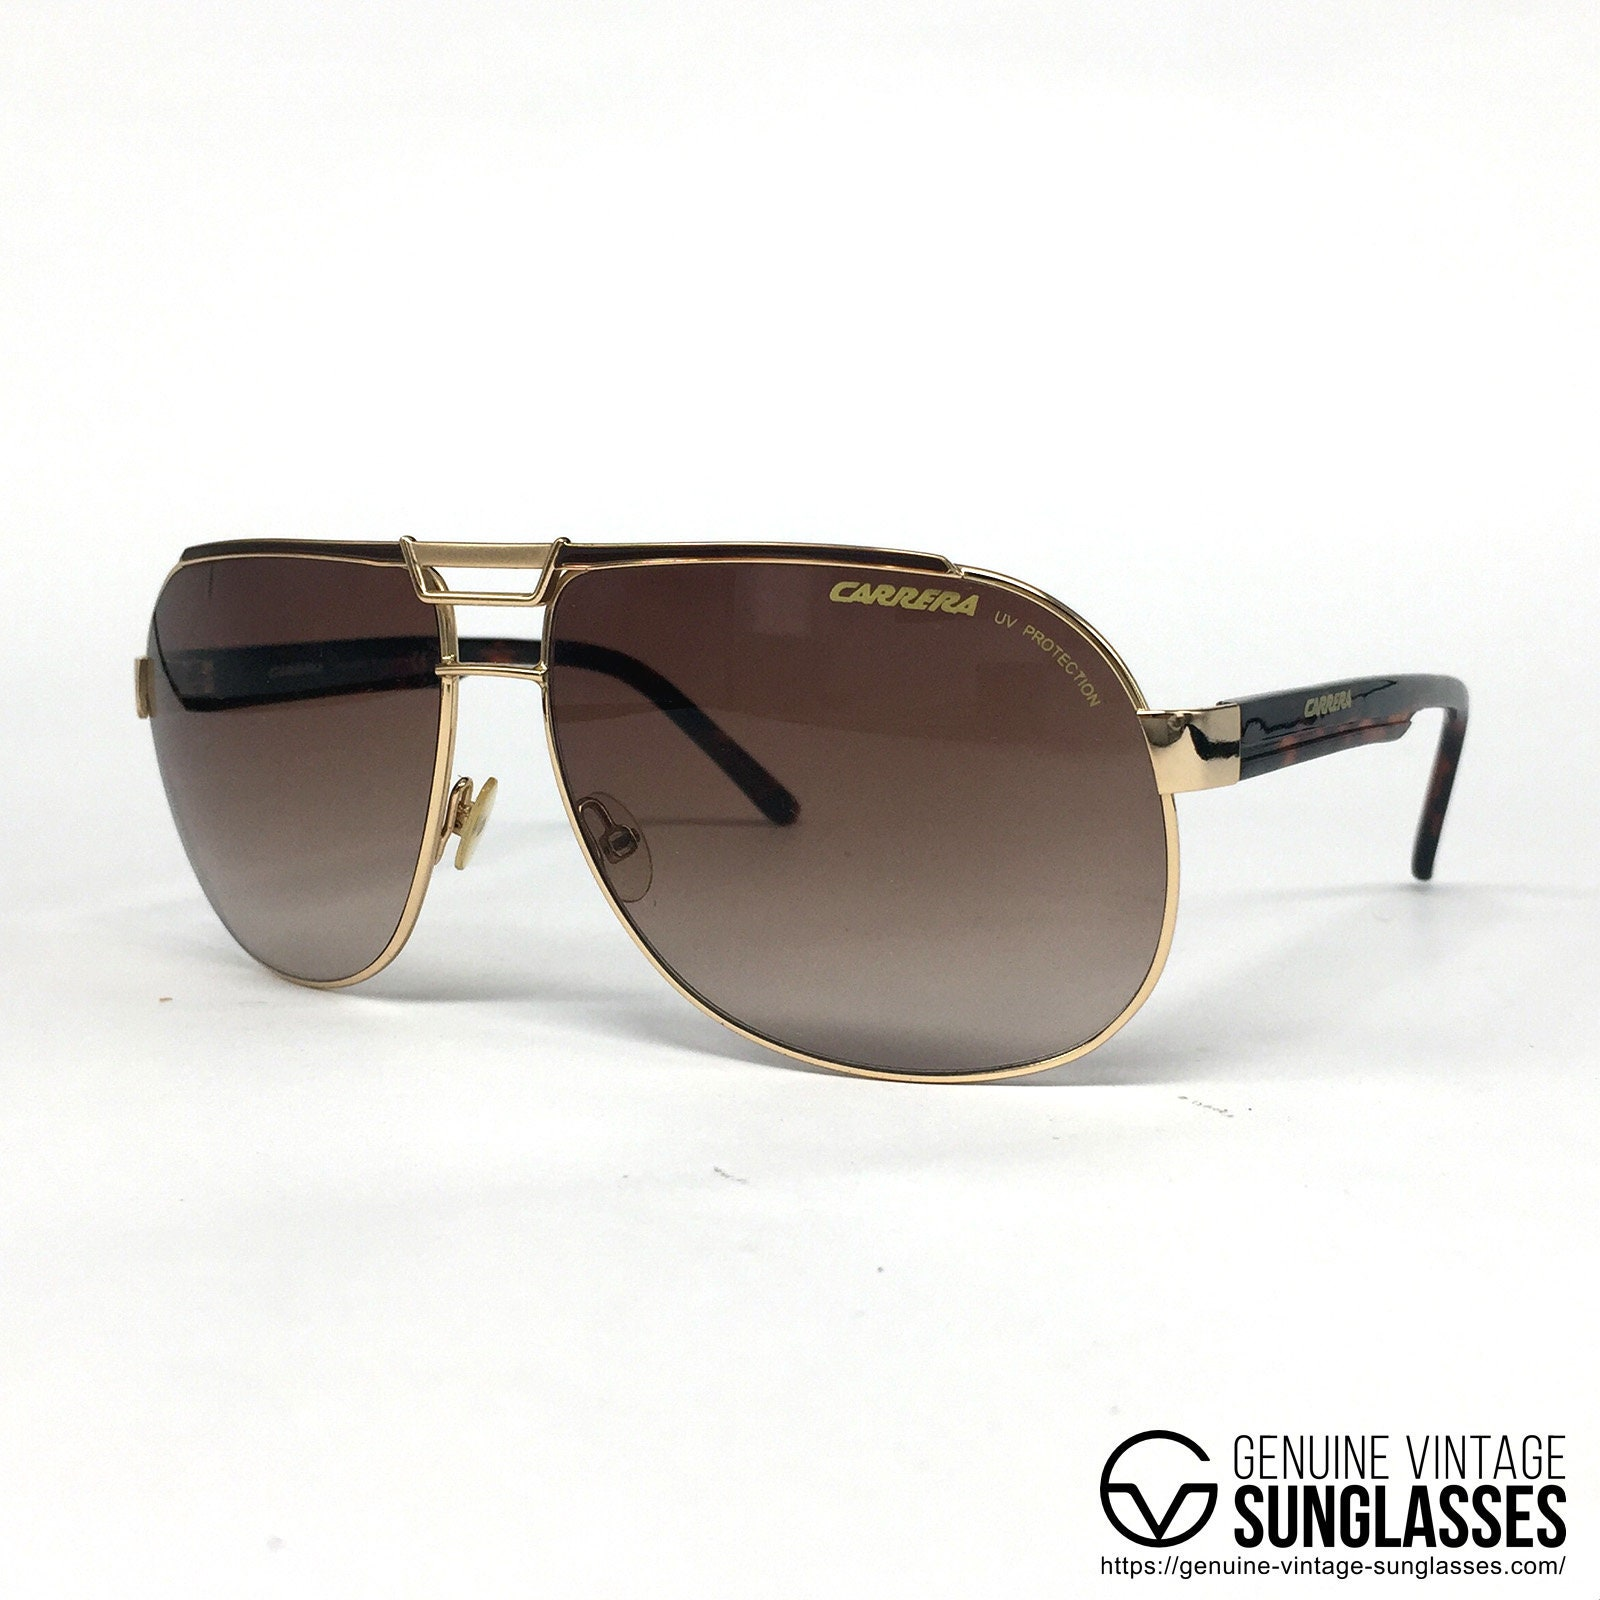 5891eddecf7 NOS Carrera Dakar gold vintage sunglasses large